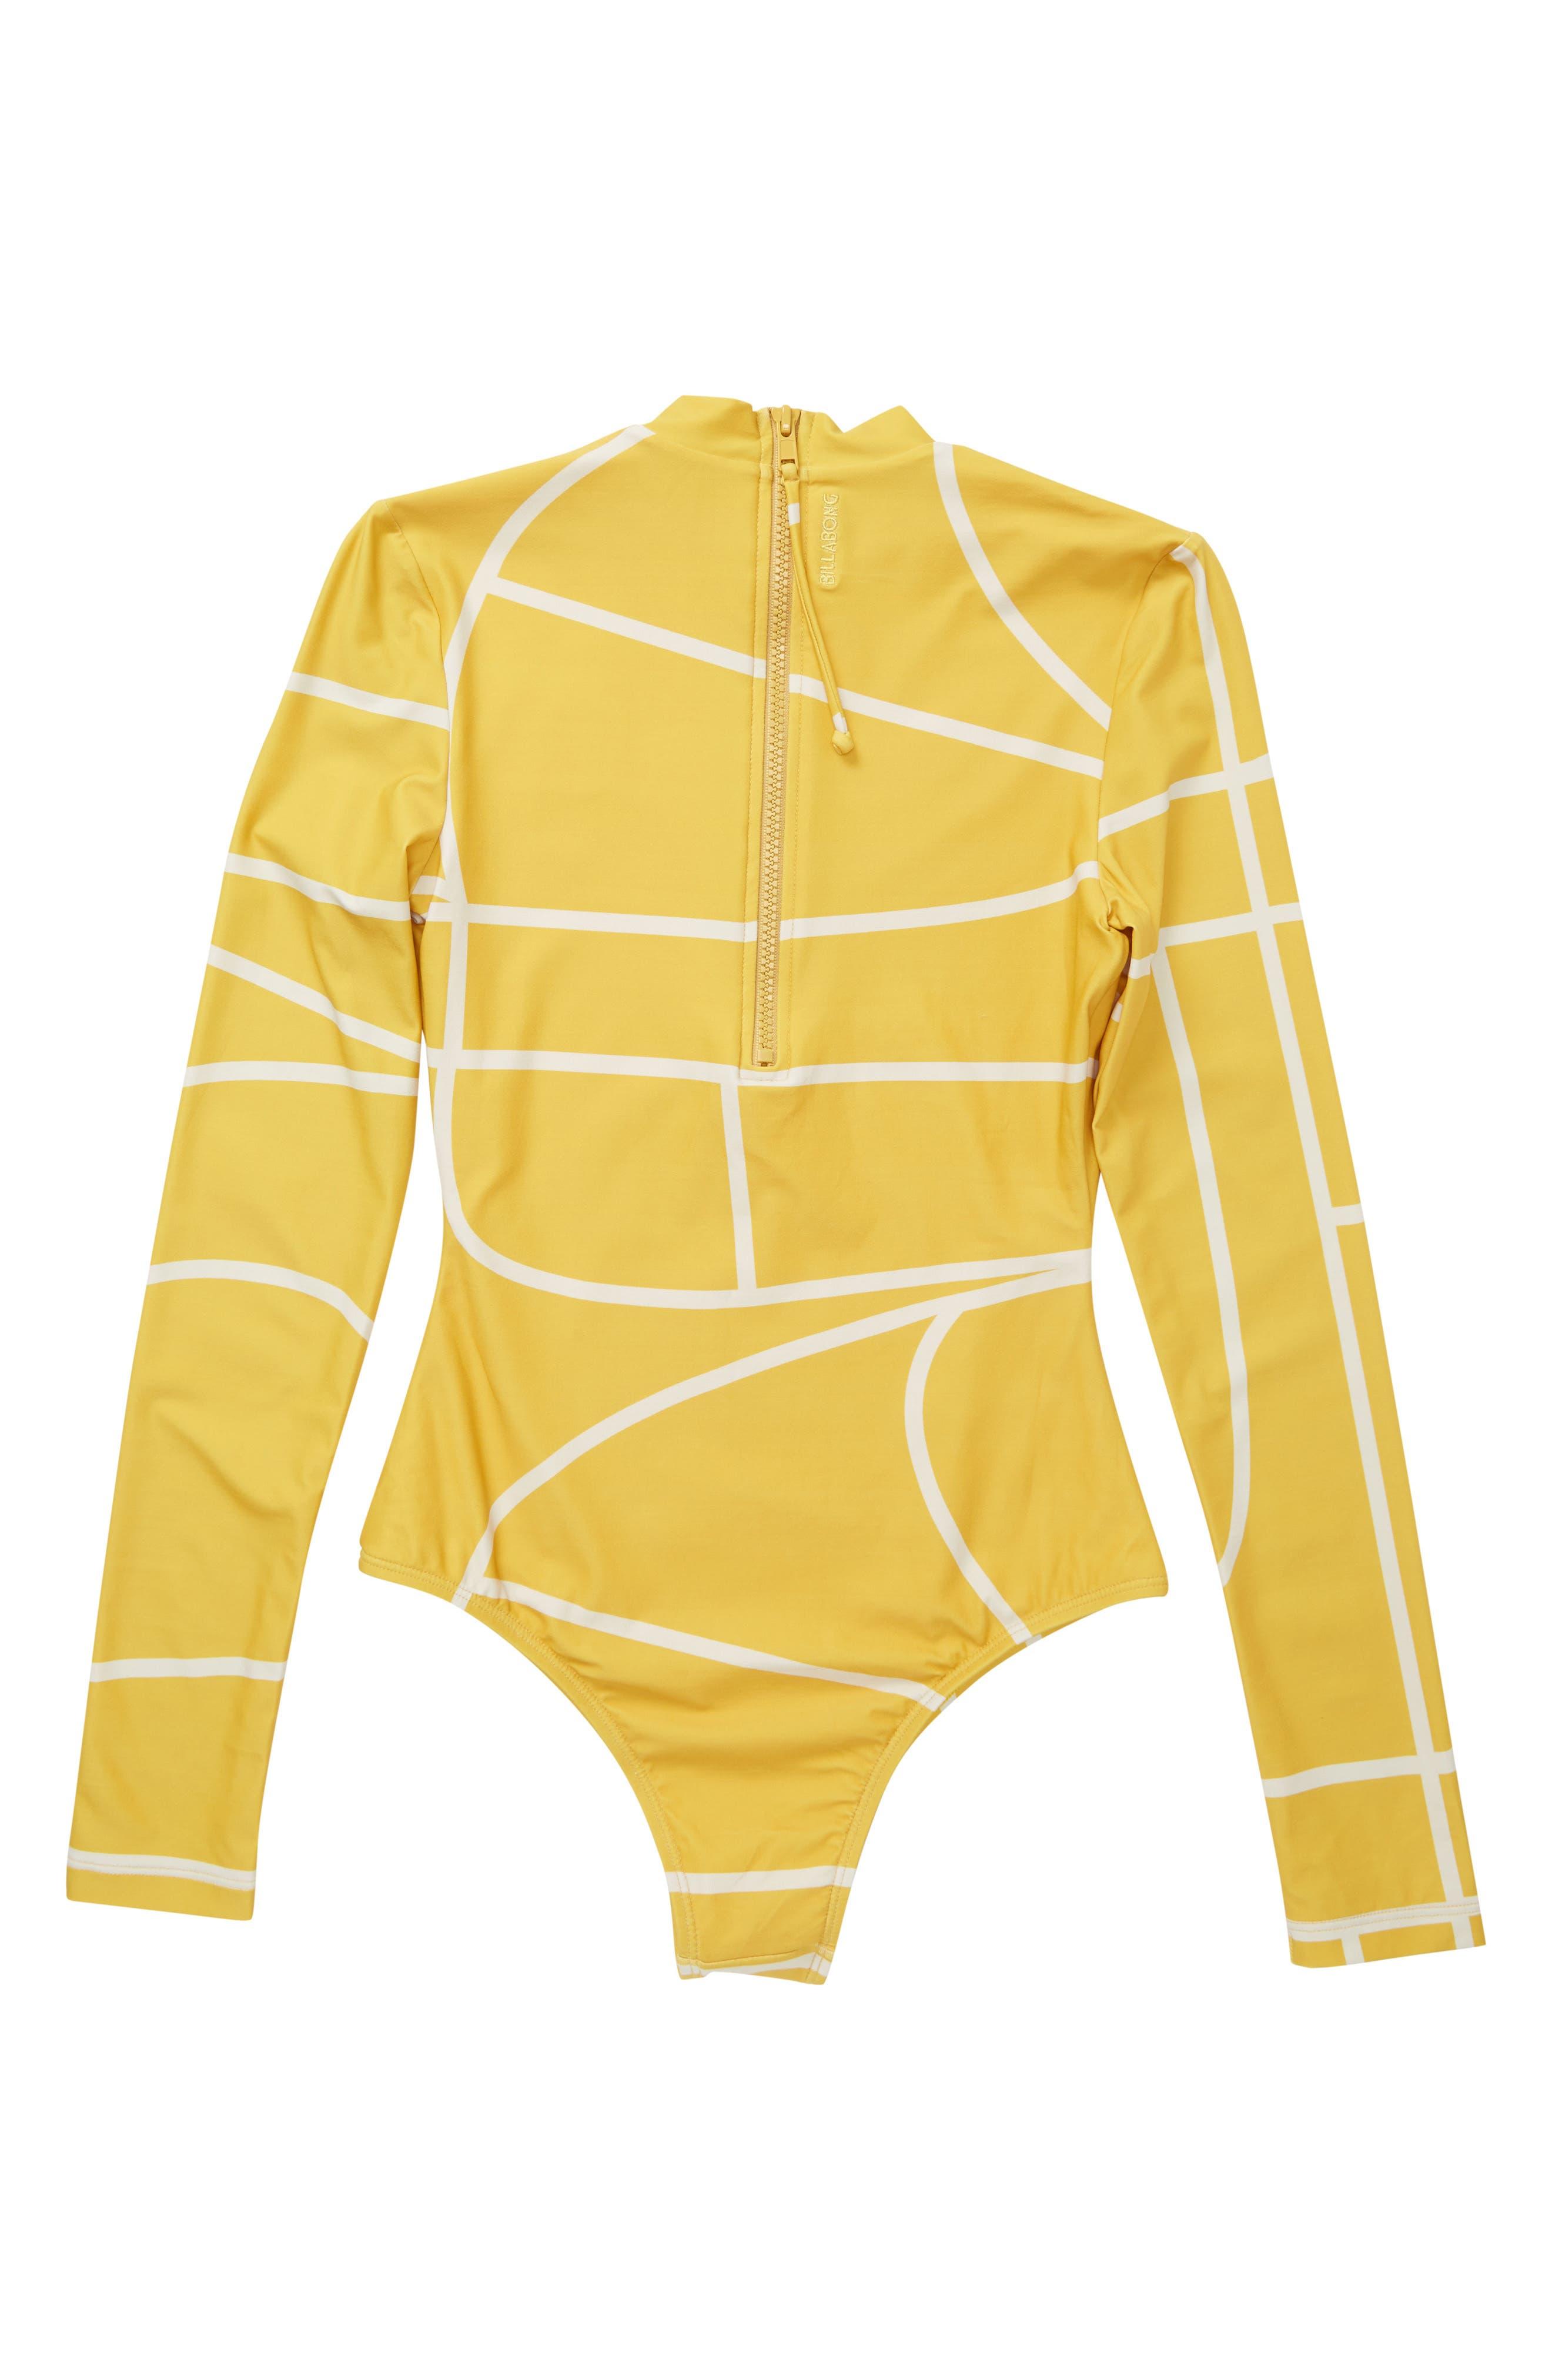 Babylon Rashguard Bodysuit,                             Alternate thumbnail 2, color,                             710